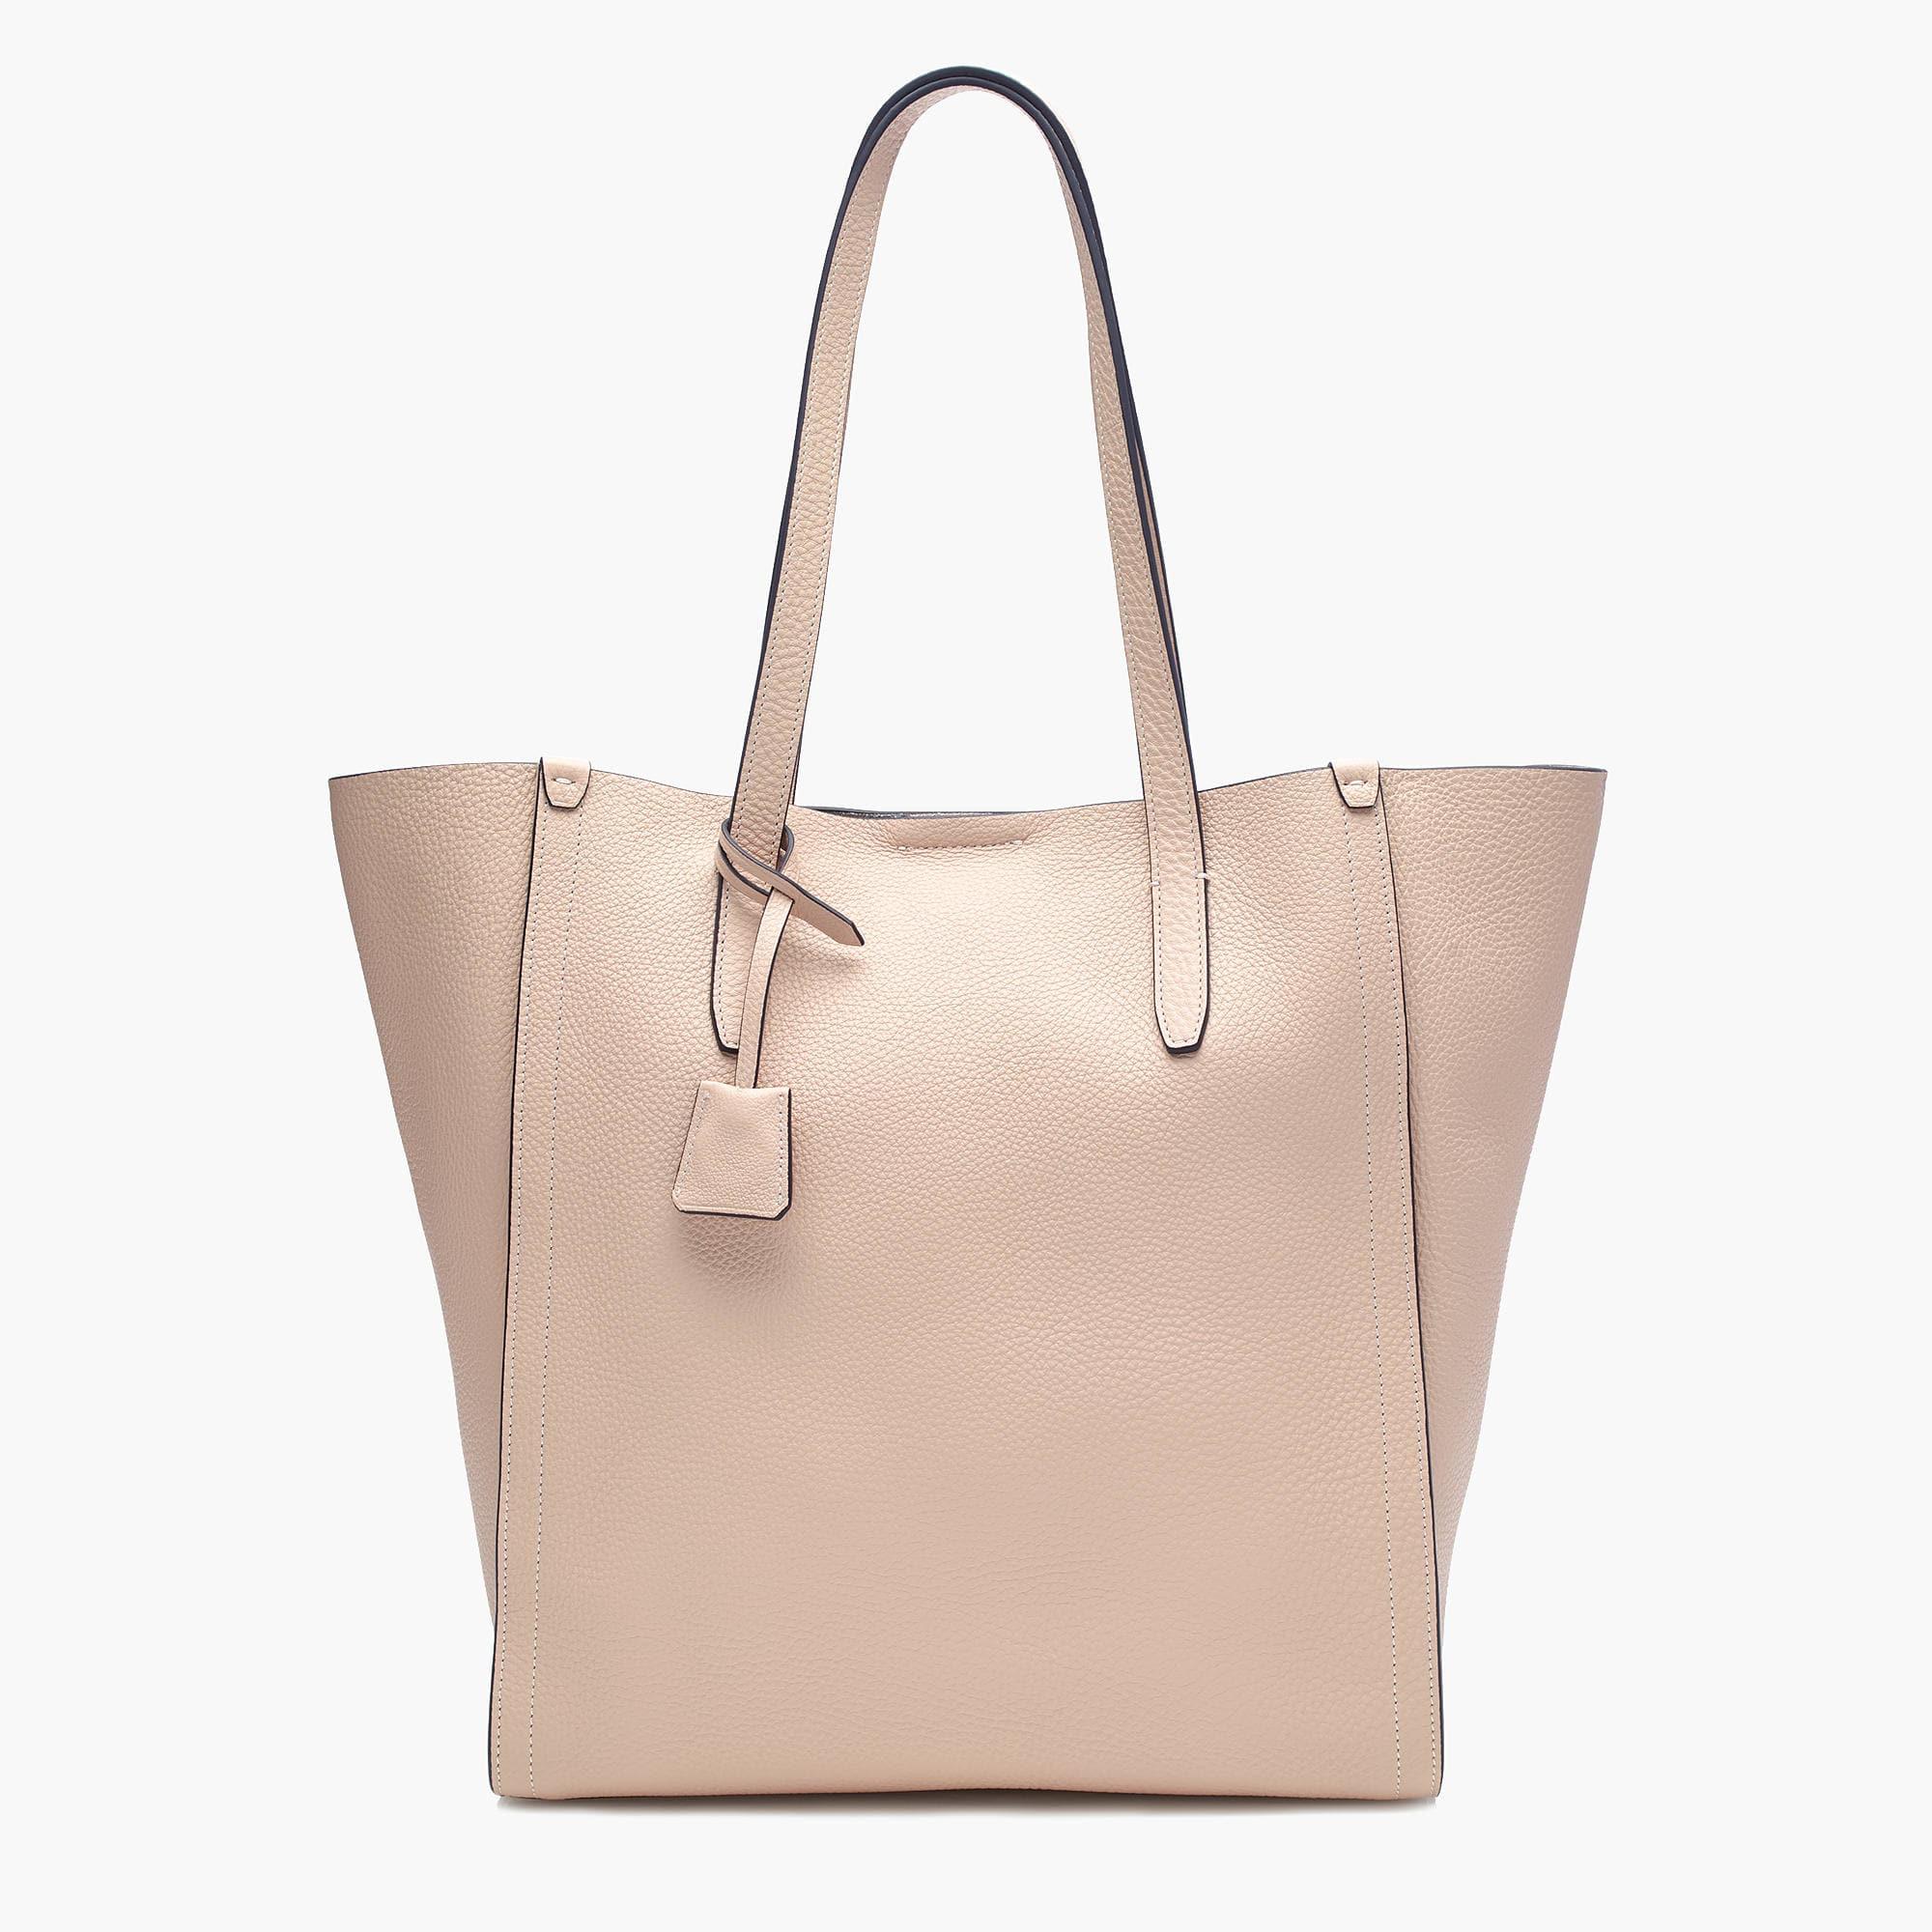 J.Crew-Bag